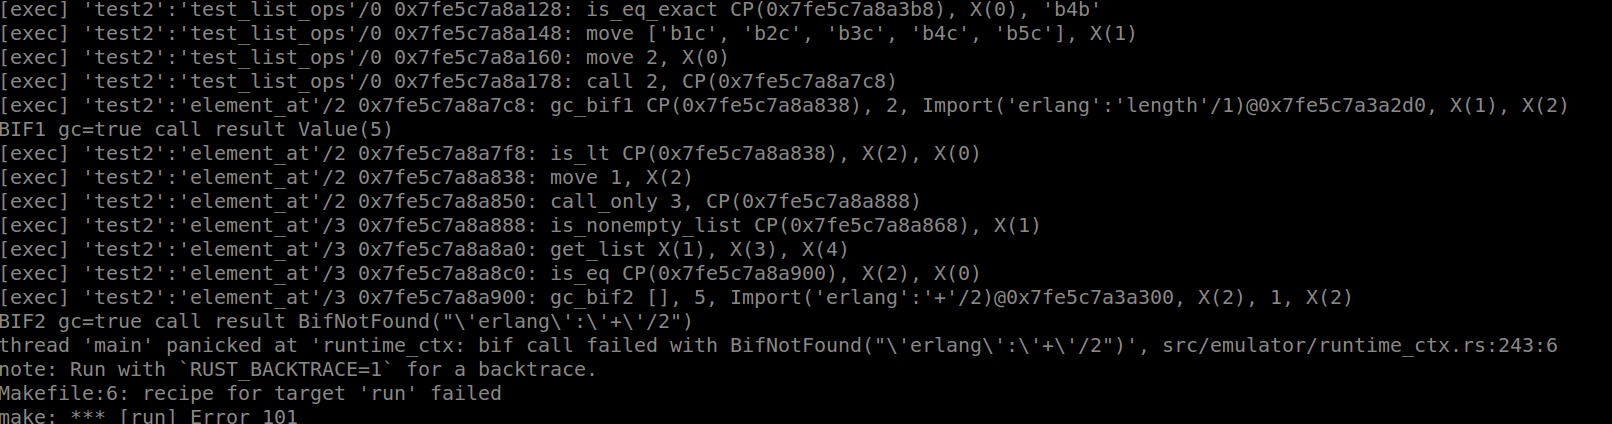 Test2.erl run output